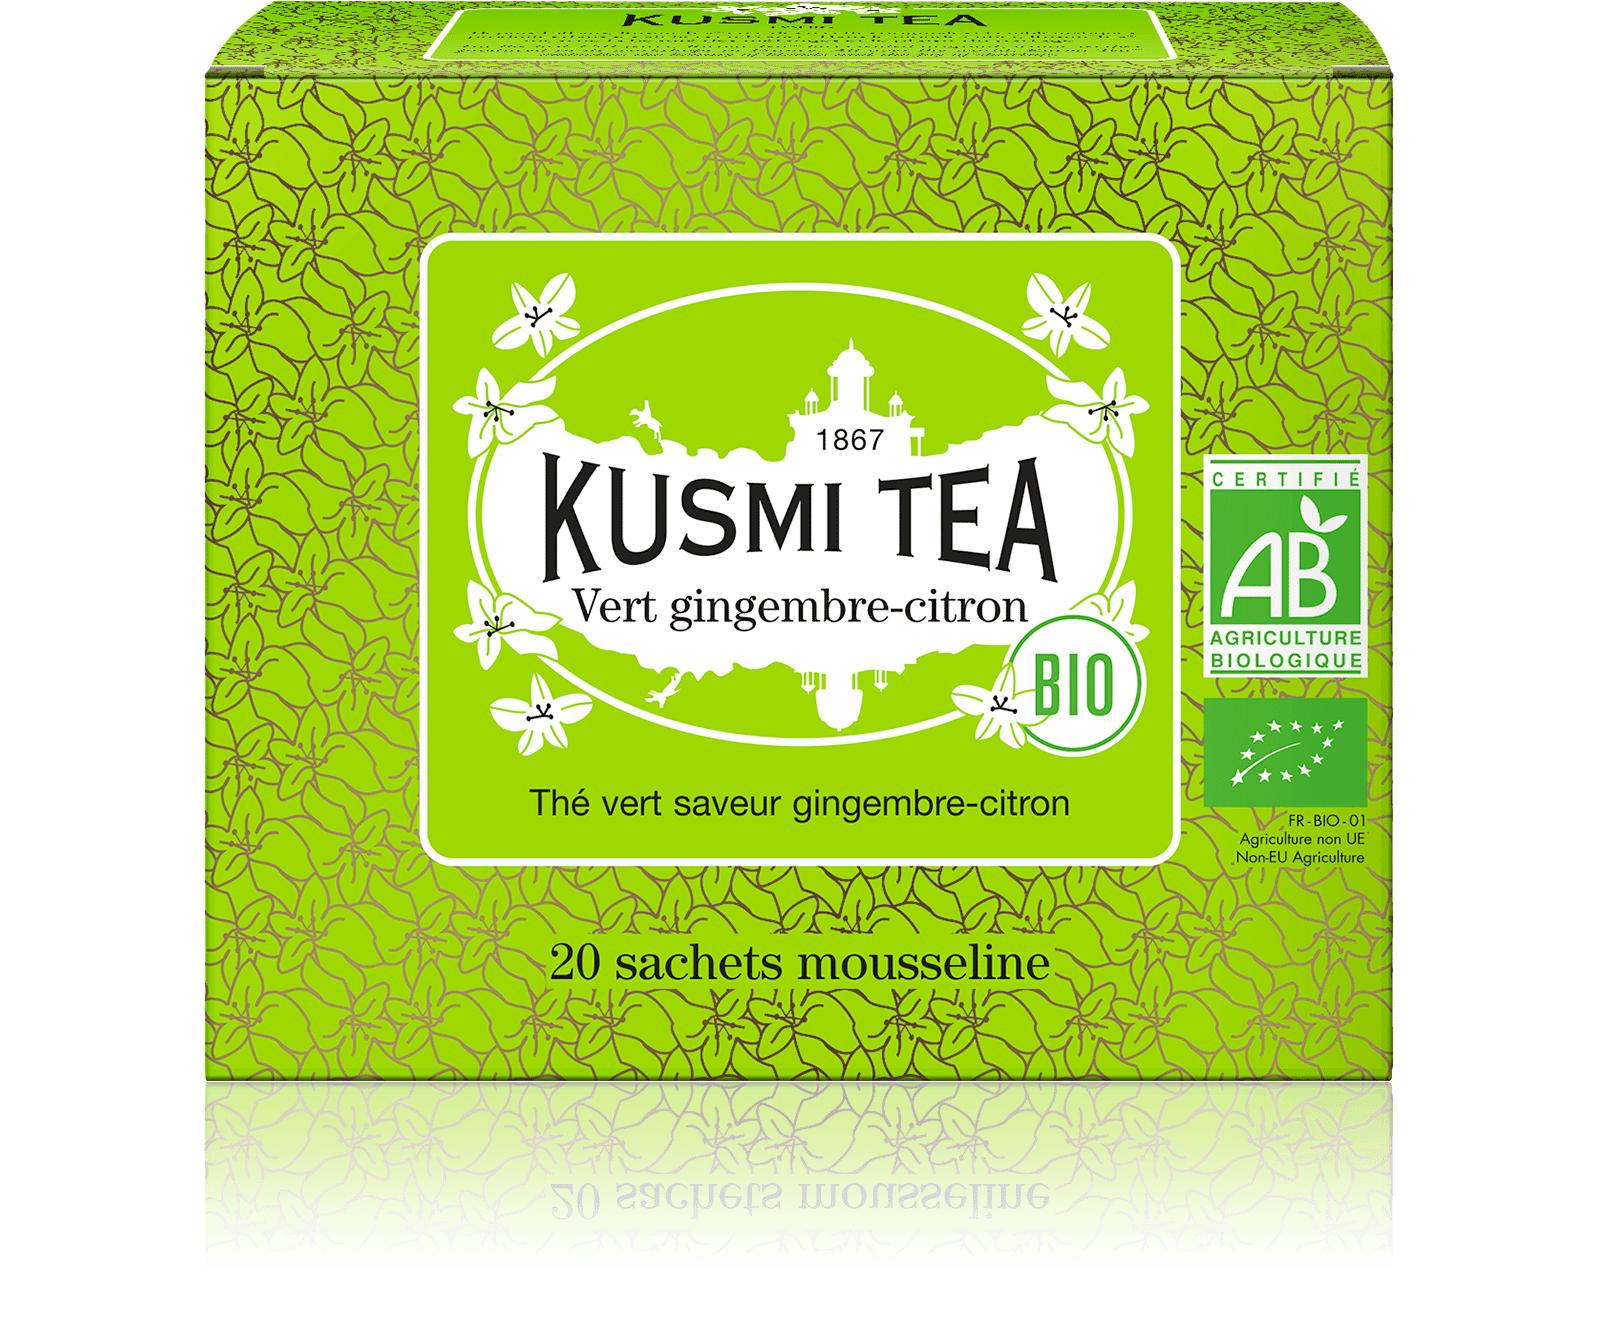 KUSMI TEA Vert gingembre-citron bio - Thé vert, gingembre, citron - Sachets de thé - Kusmi Tea